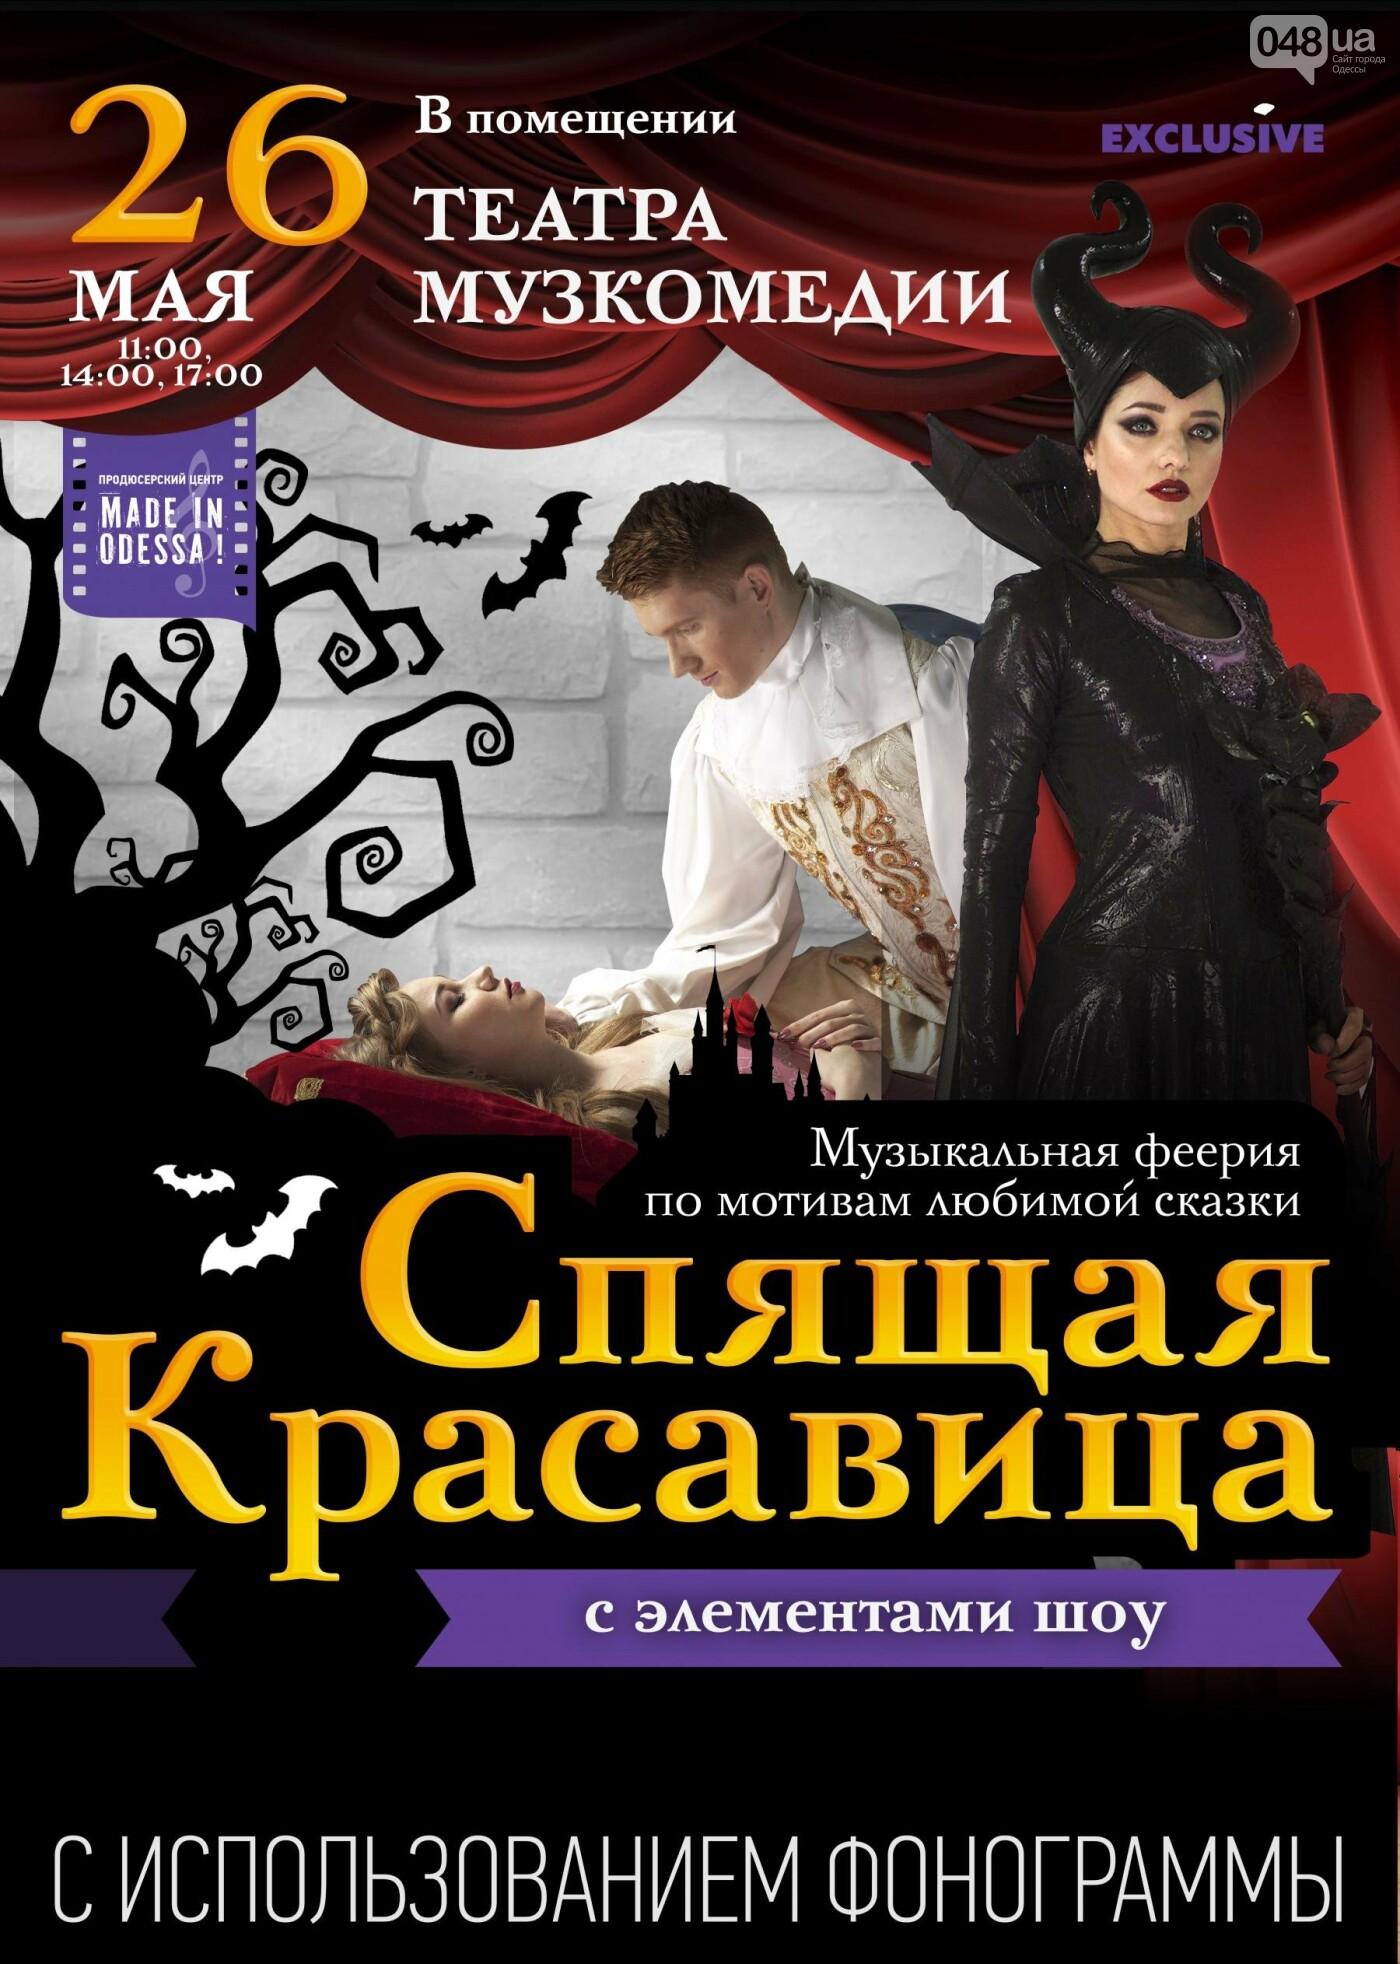 В одесском театре на сто лет уснет красавица (АФИША), фото-1